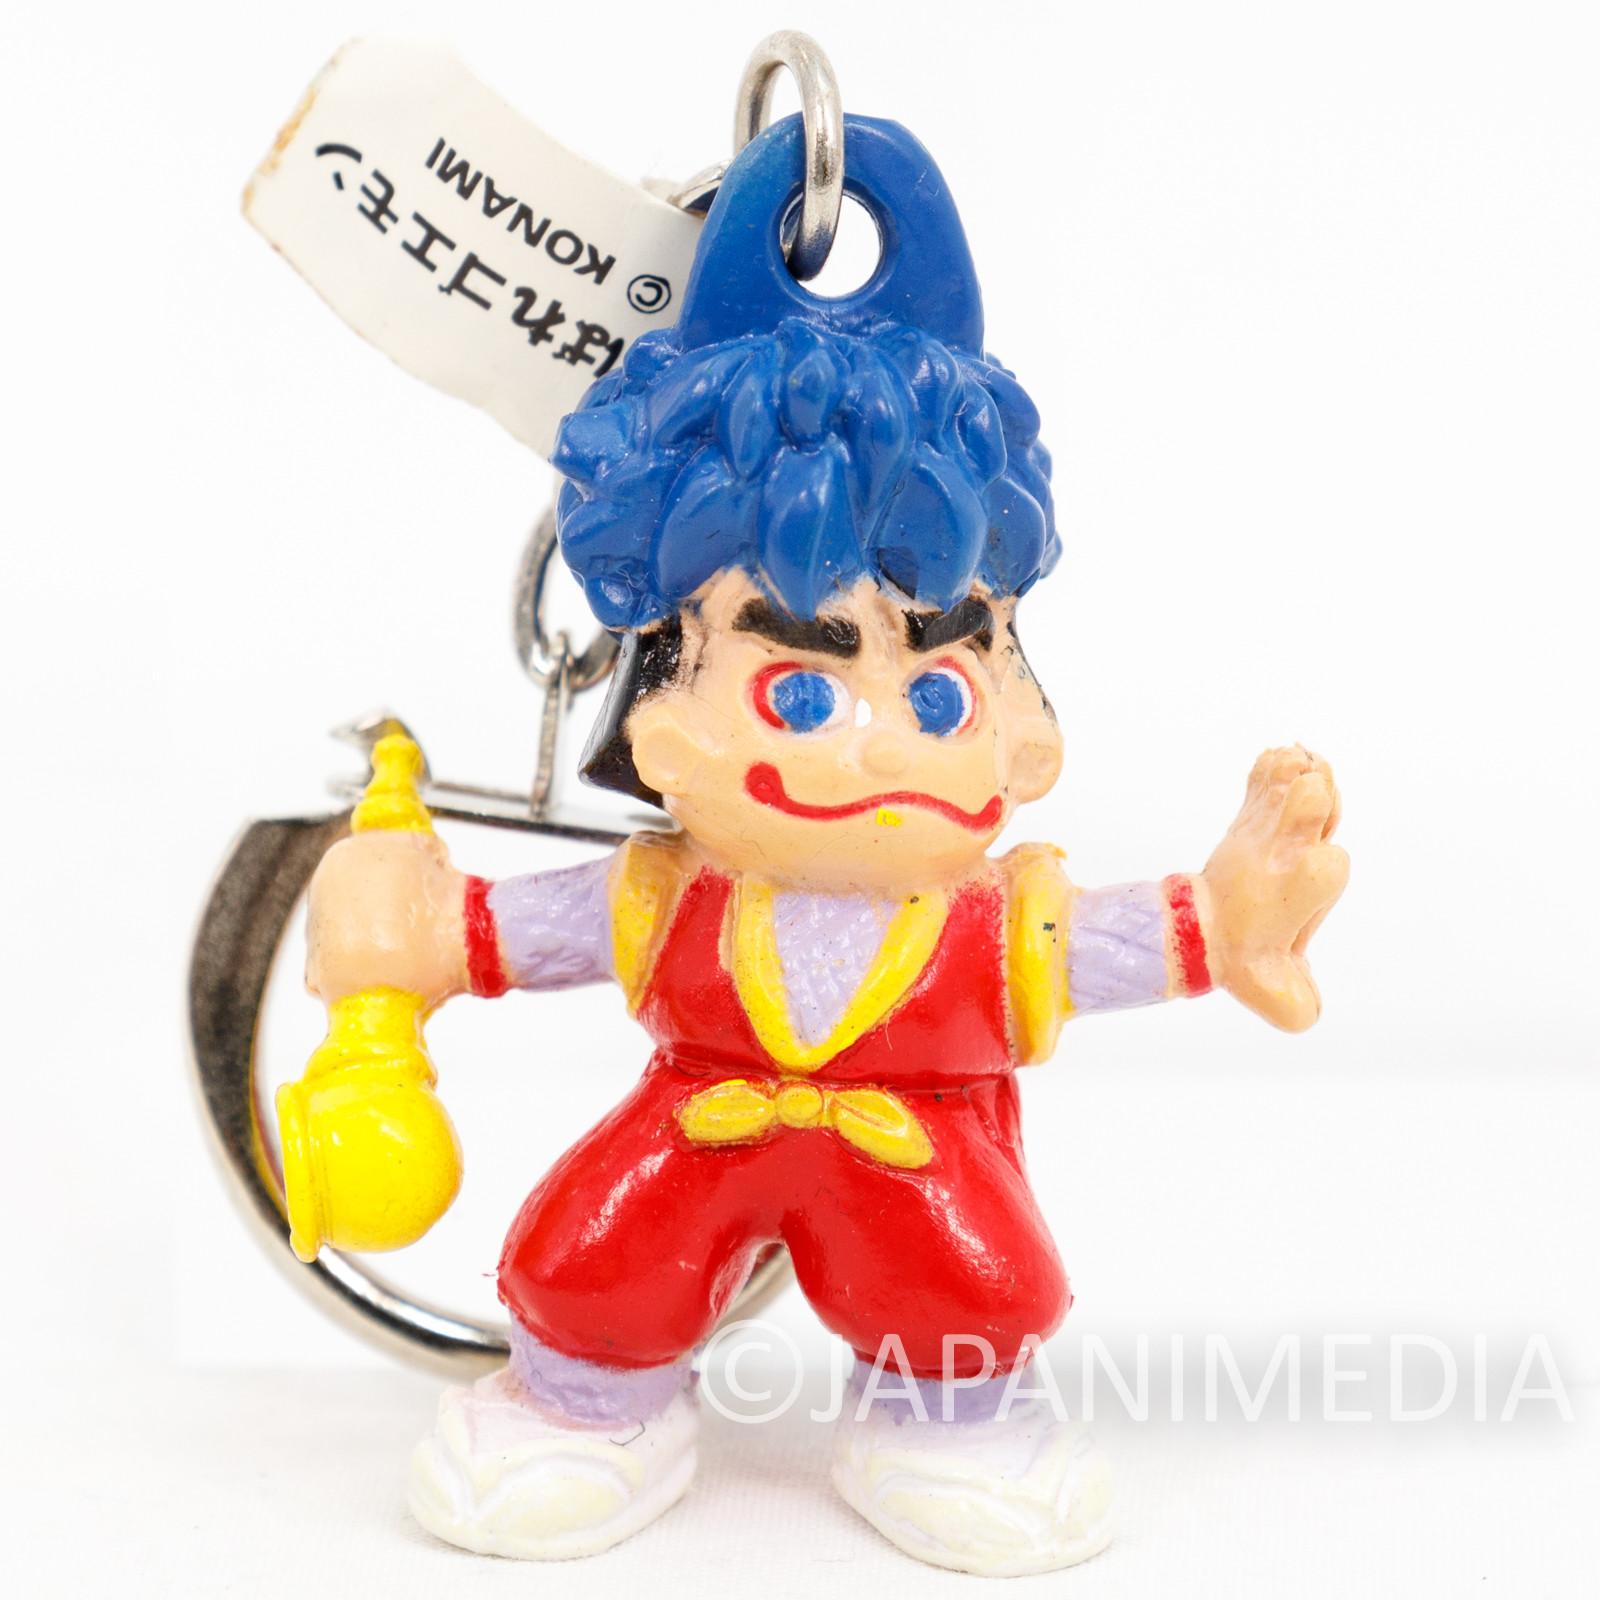 Ganbare Goemon Figure Keychain JAPAN GAME KONAMI